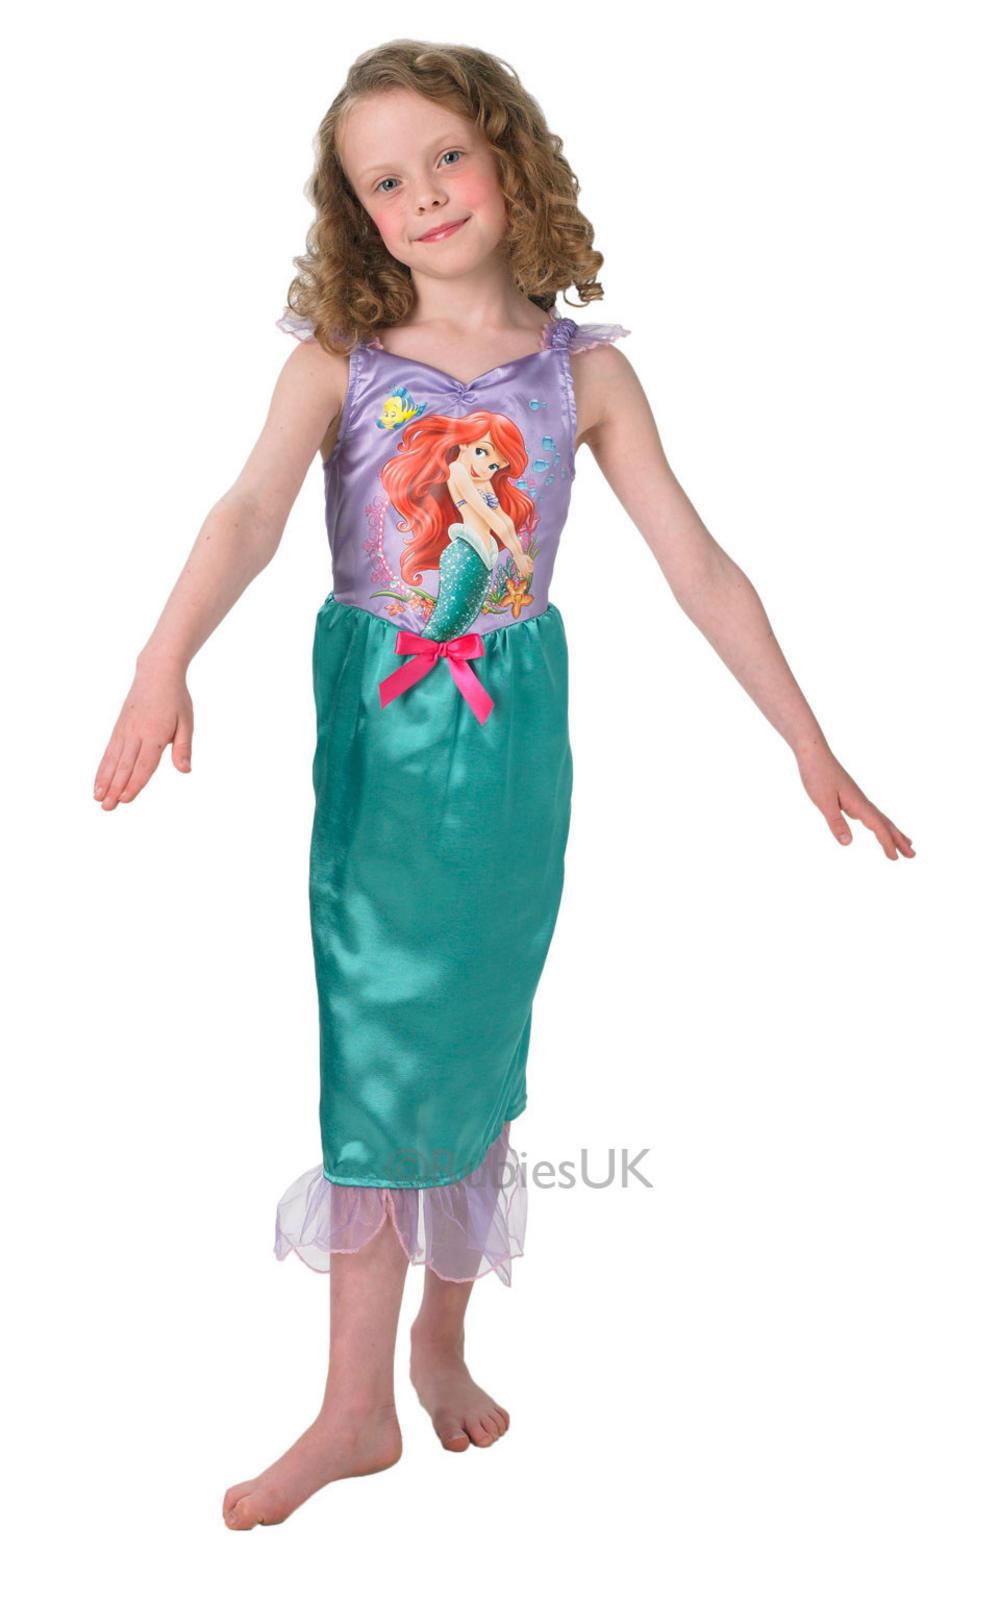 Girls Storytime Ariel Costume